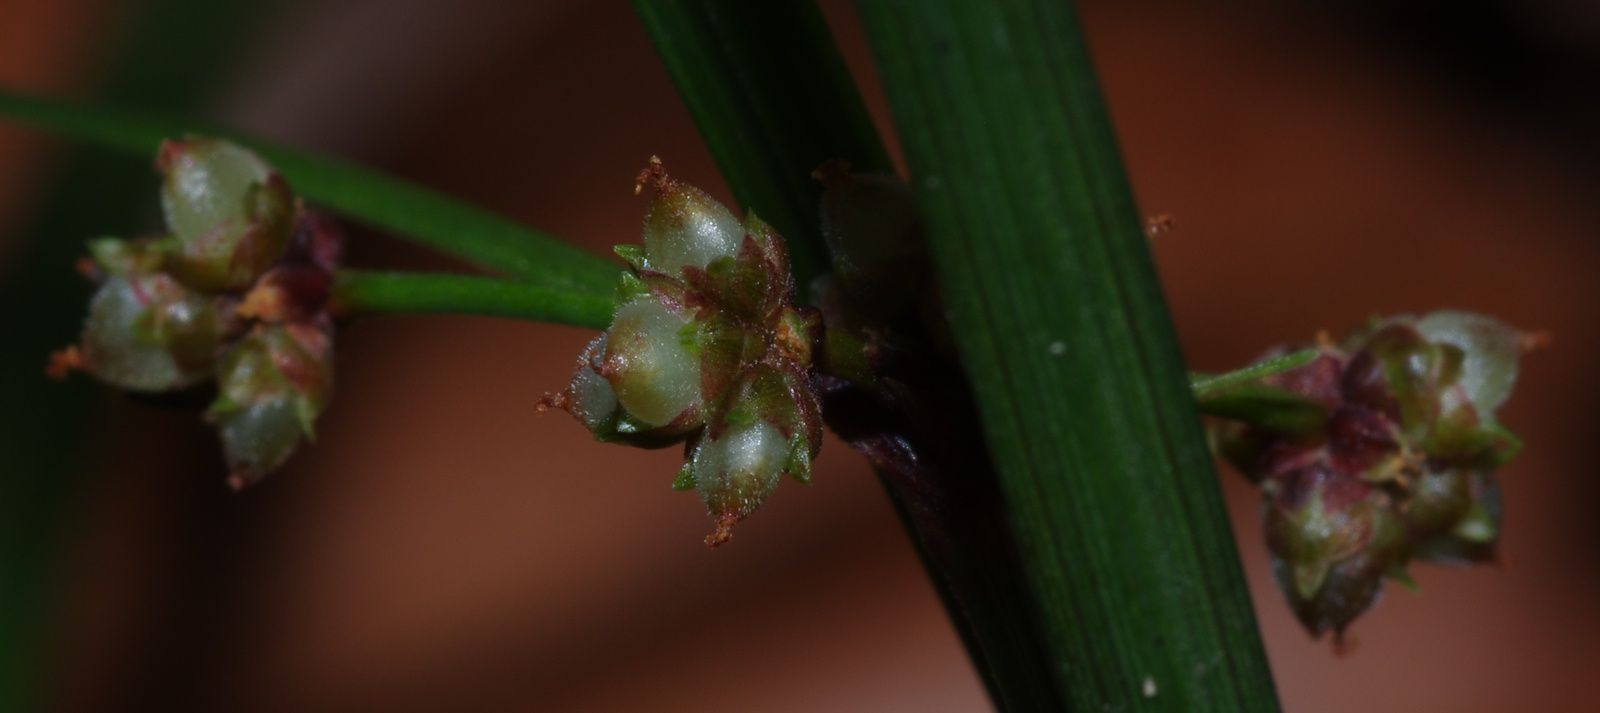 Calyptrocarya poeppigiana